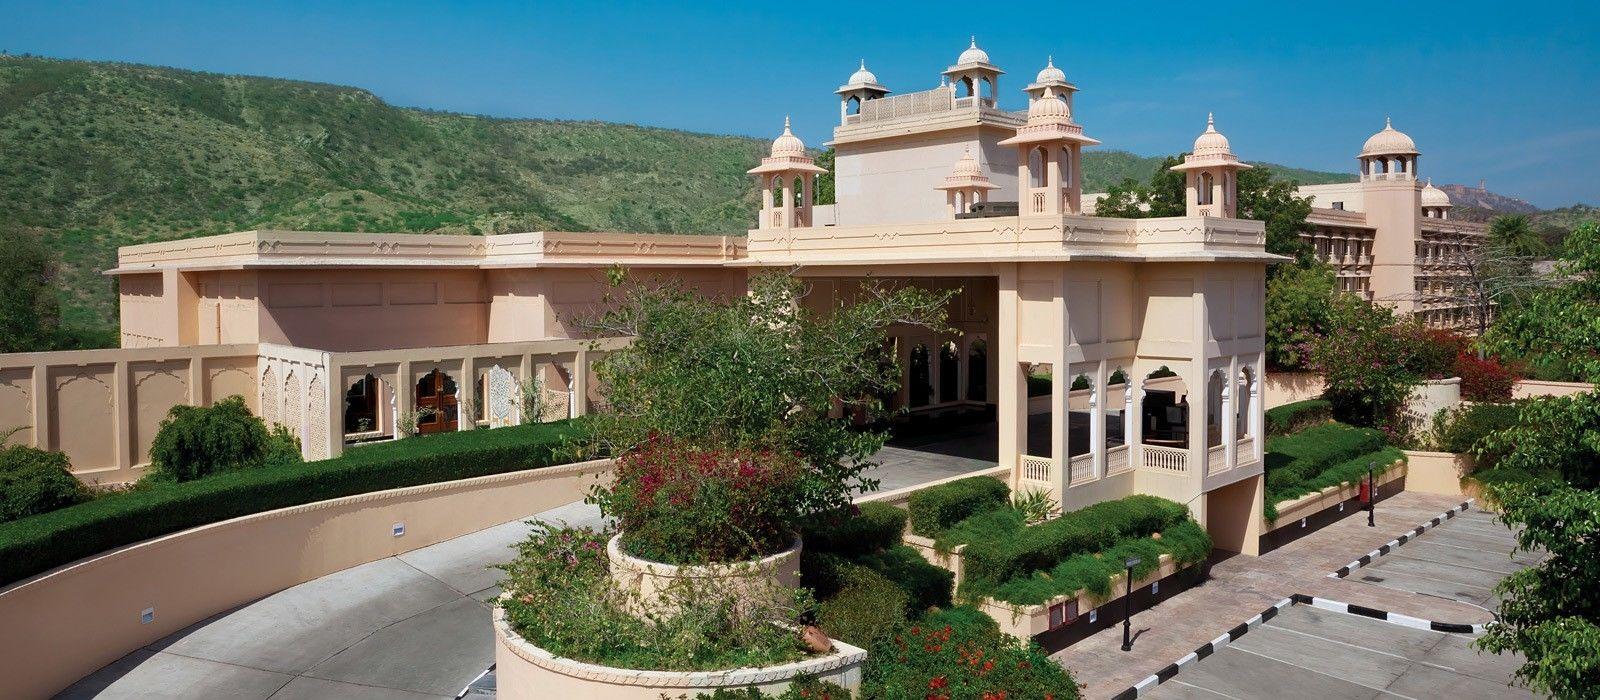 Hotel The Trident Jaipur North India